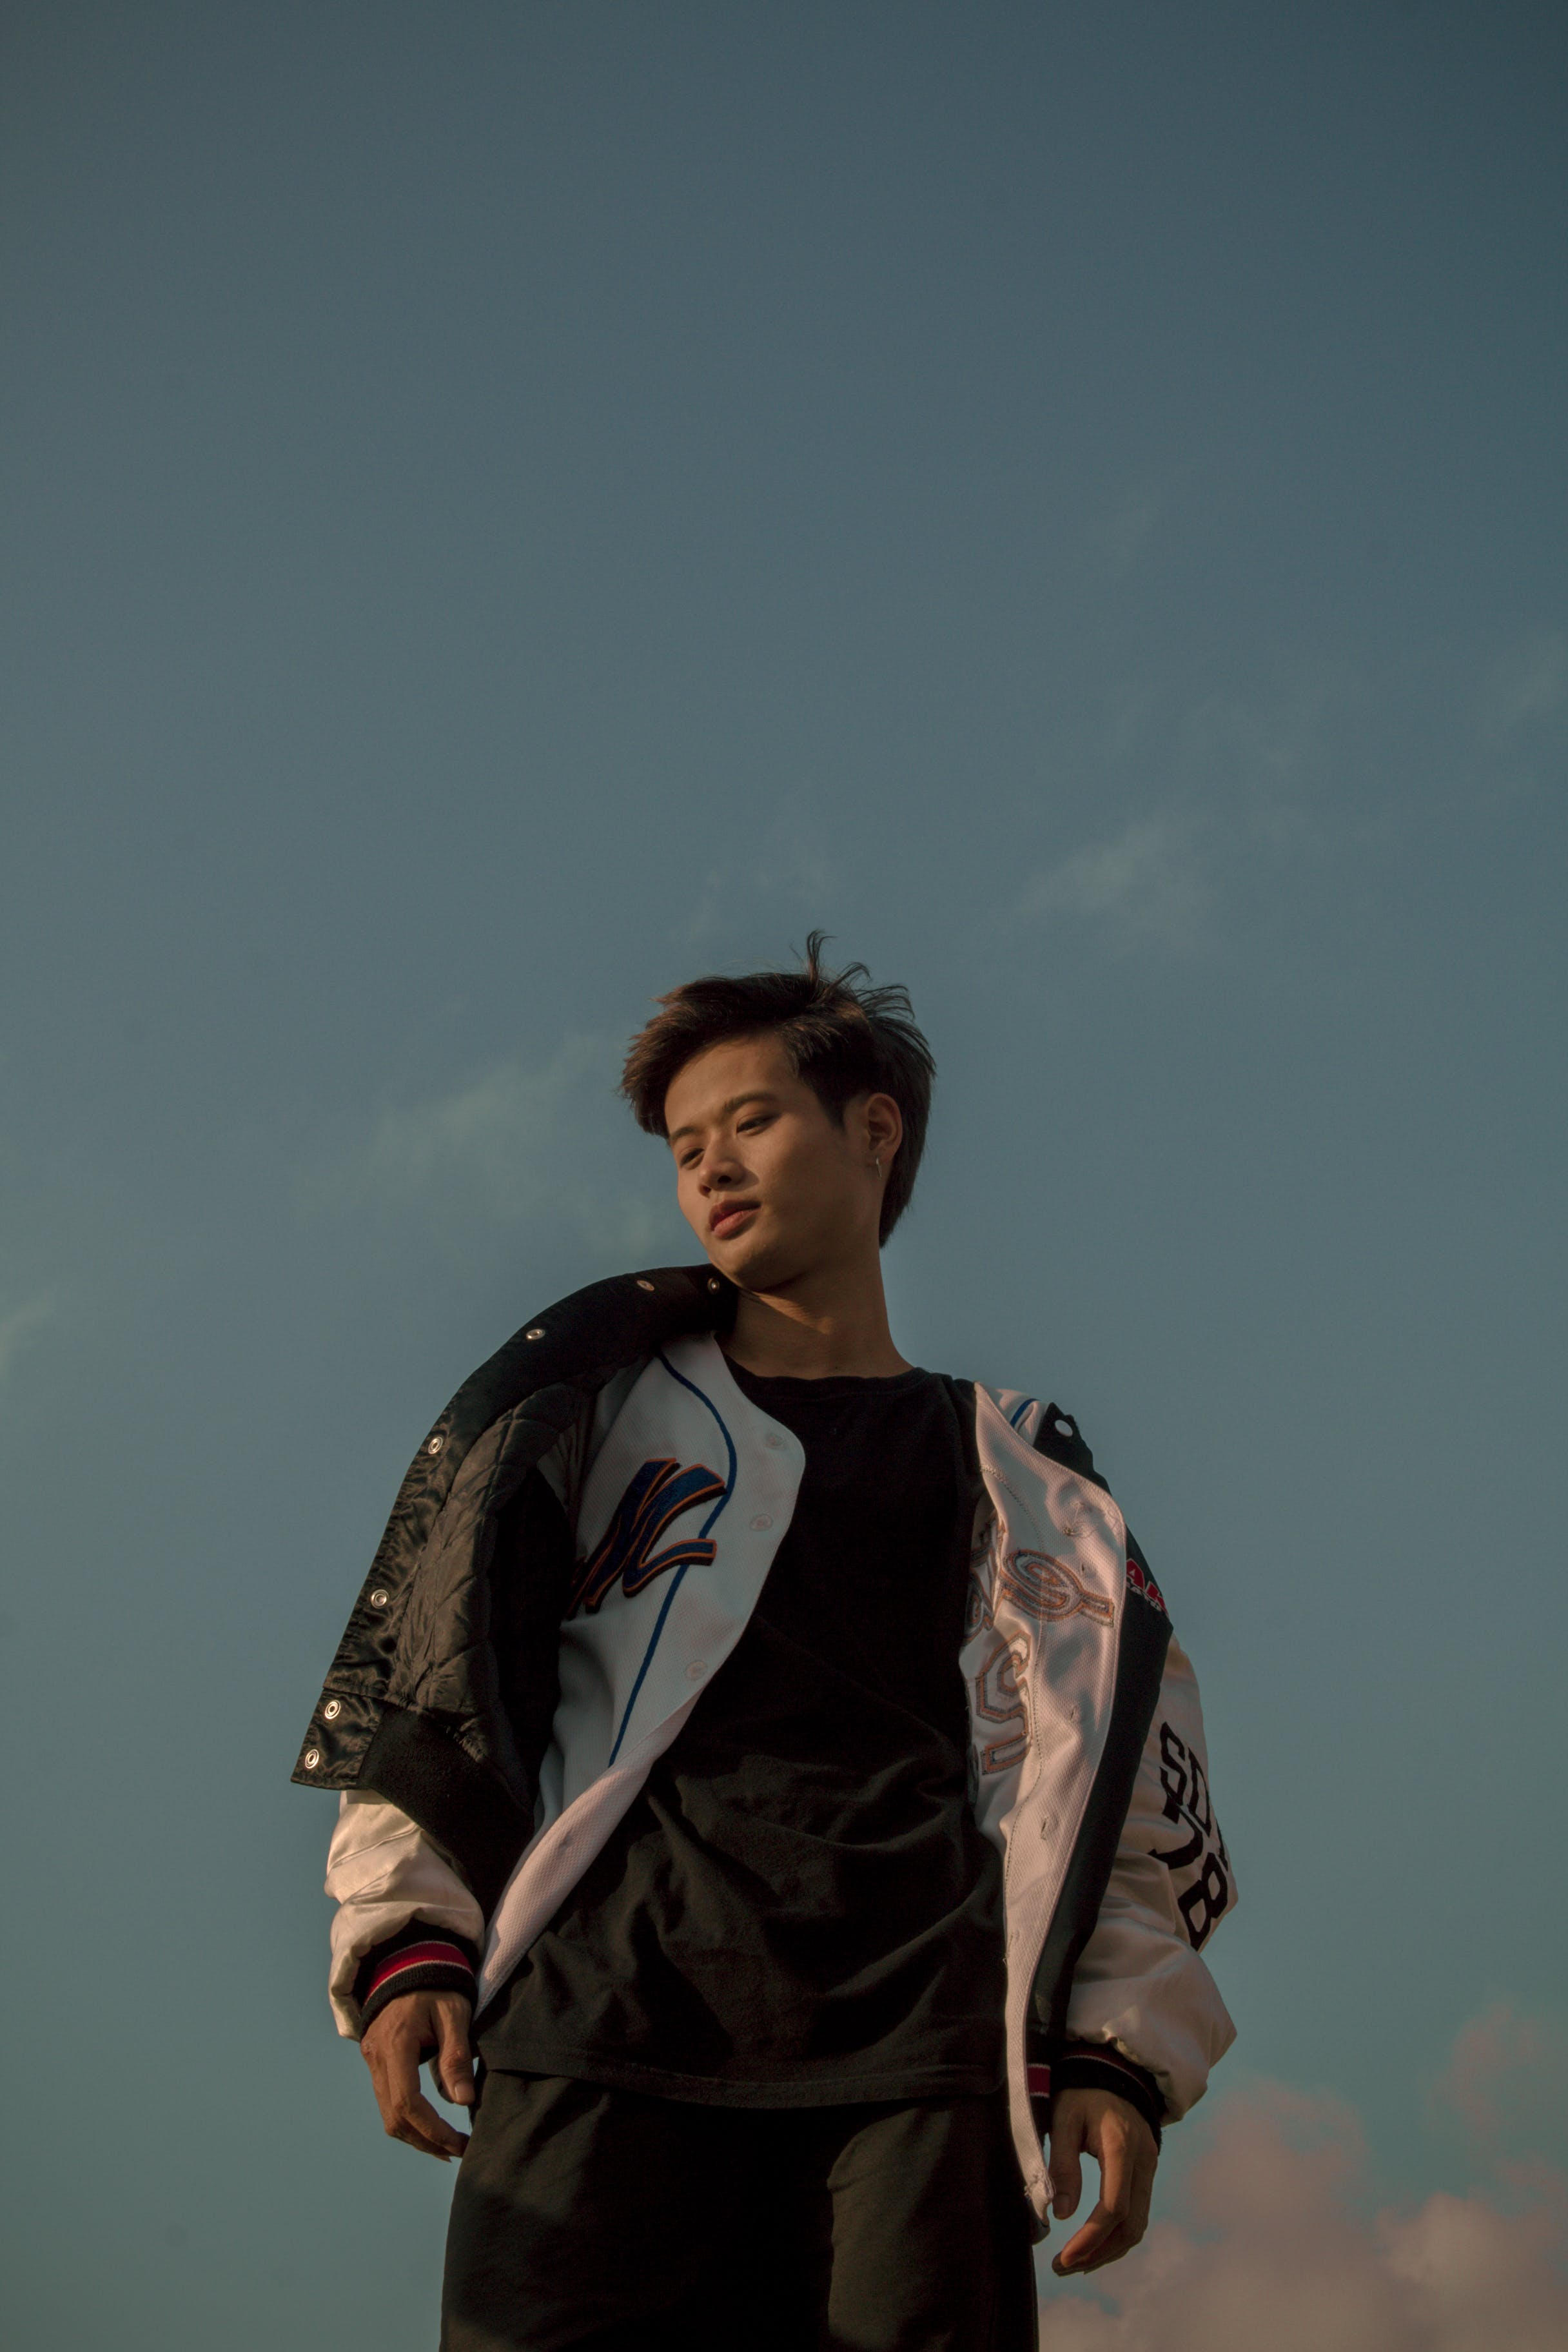 Man in White Jacket Standing Under Blue Skies